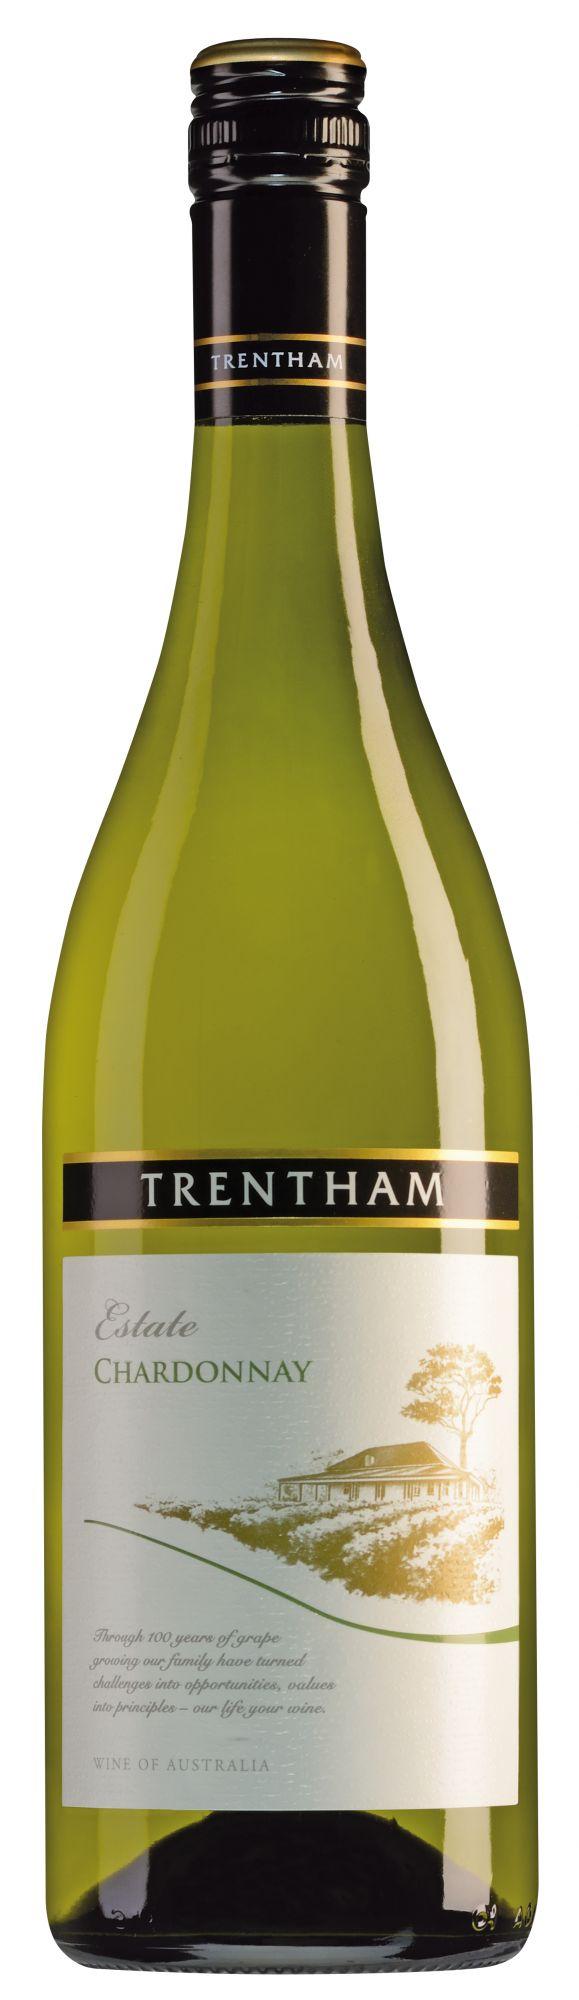 Trentham Estate Murray Darling Chardonnay